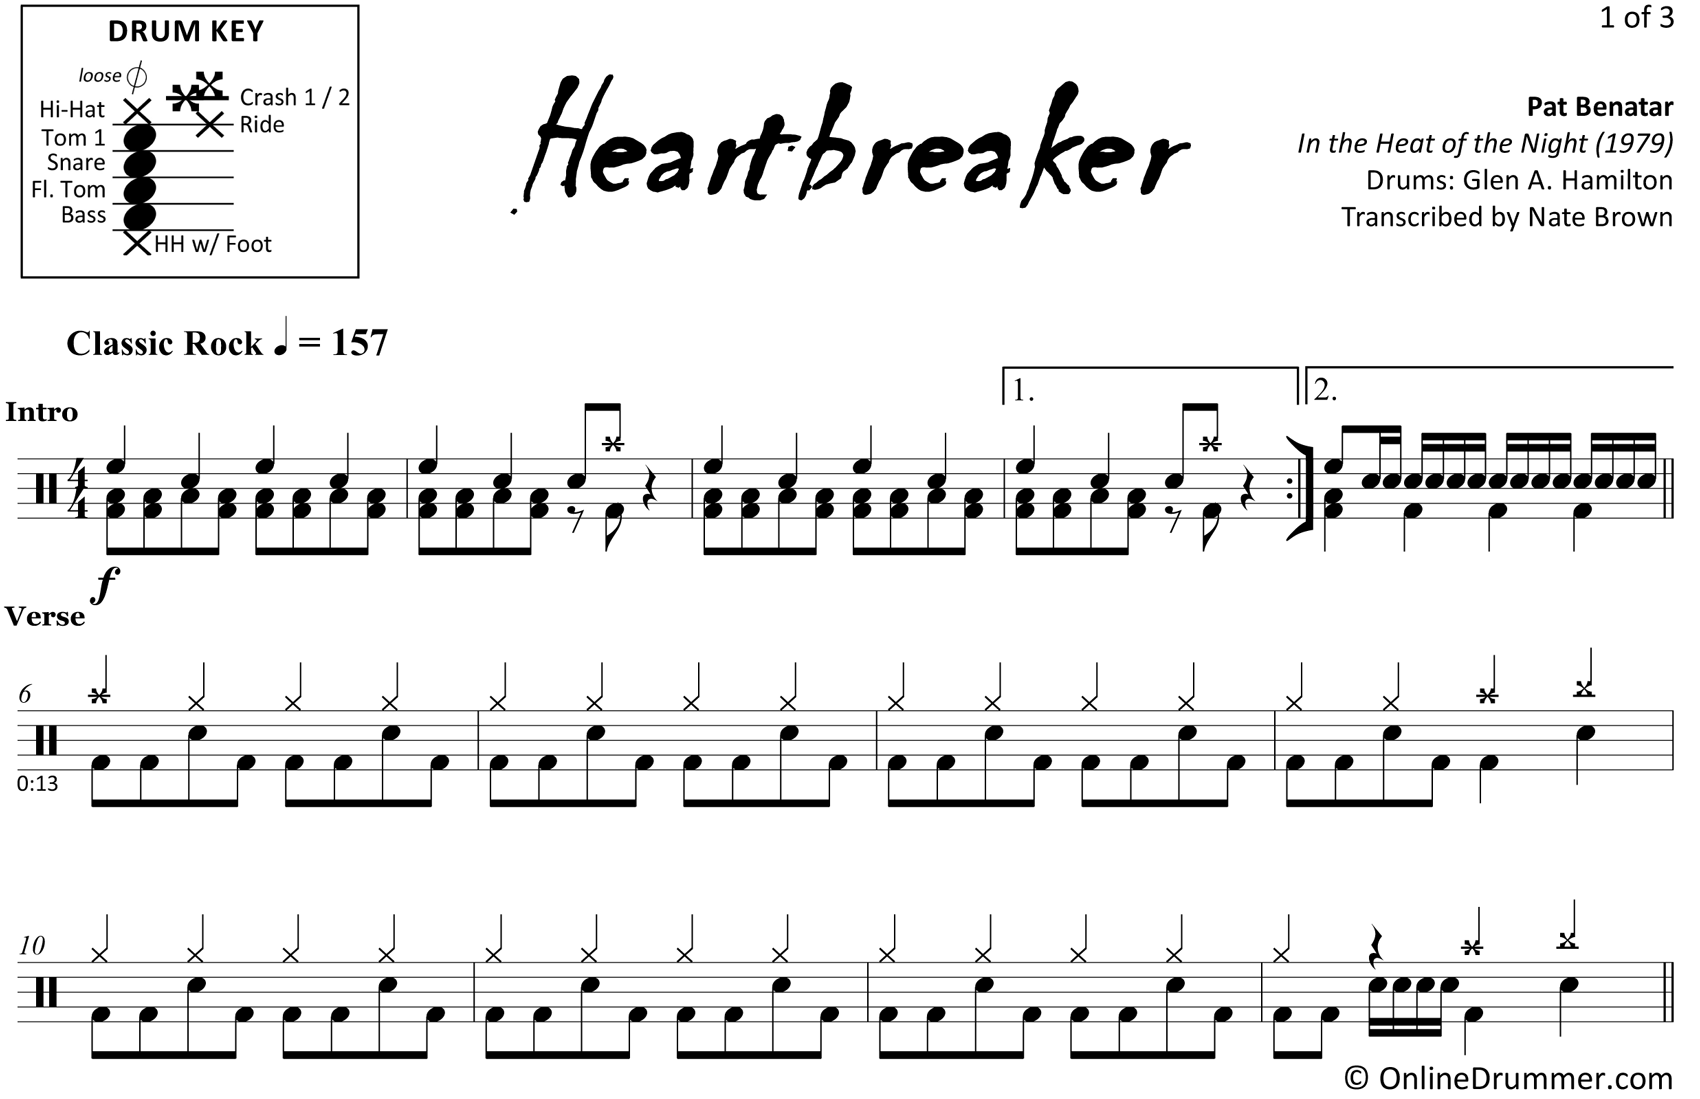 Heartbreaker - Pat Benatar - Drum Sheet Music